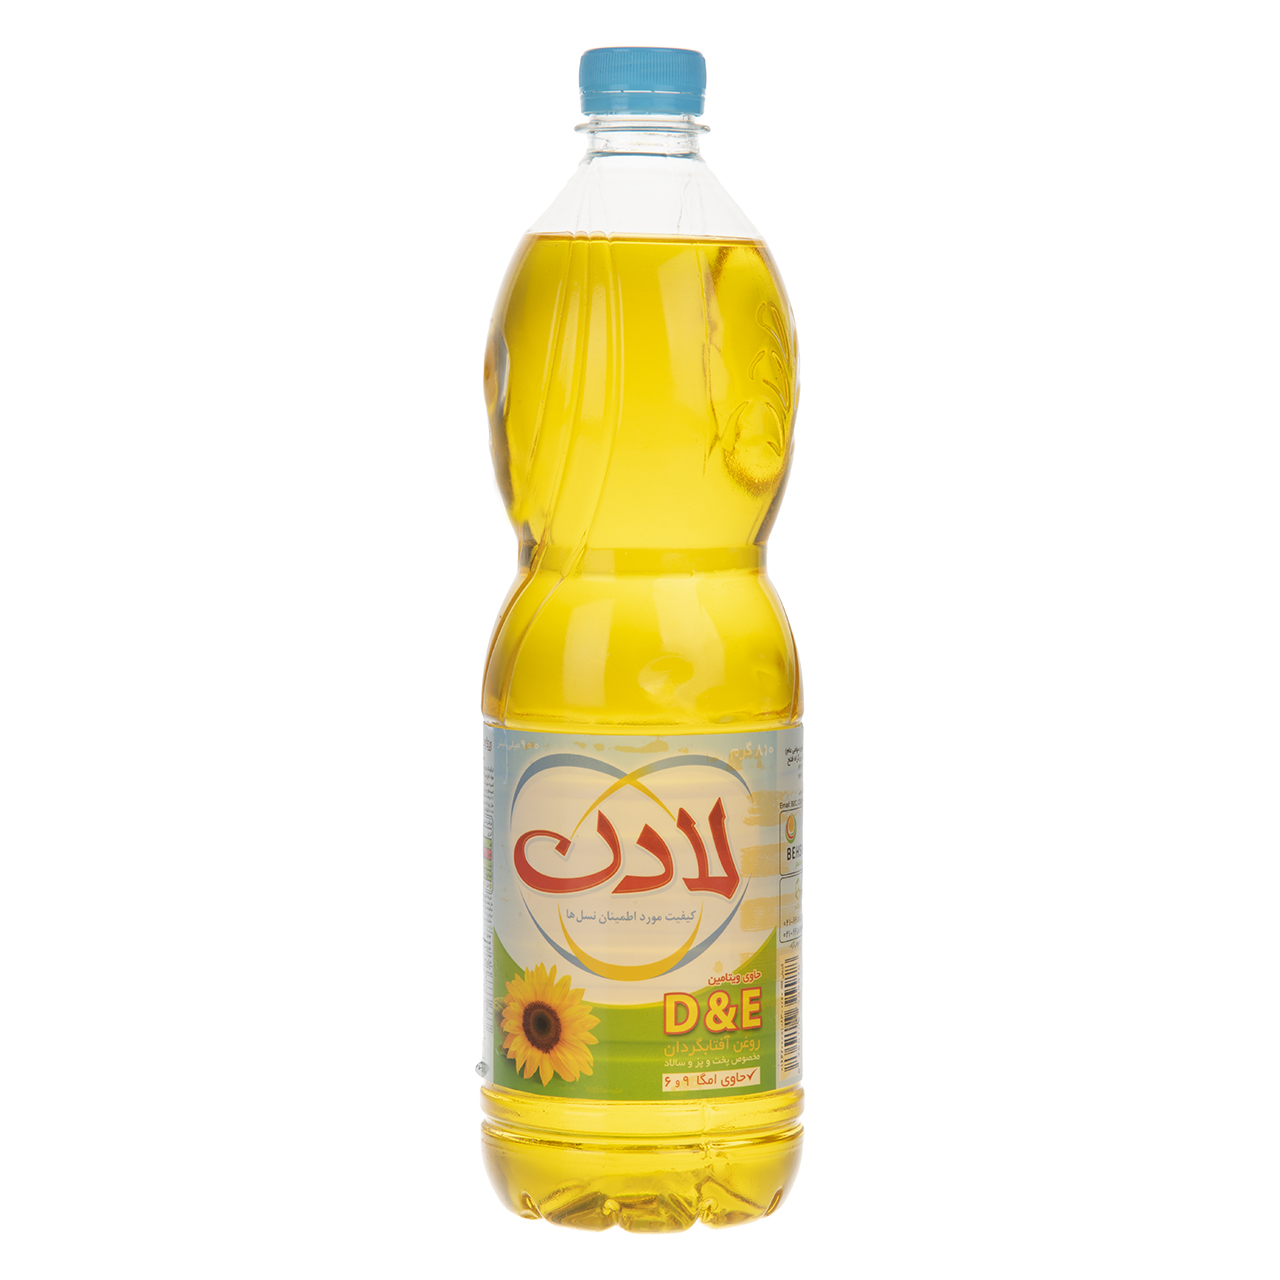 عکس روغن مایع آفتابگردان ویتامینه لادن - 810 گرم Ladan Sunflower Liquid Vitamin Oil - 810 gr روغن-مایع-افتابگردان-ویتامینه-لادن-810-گرم